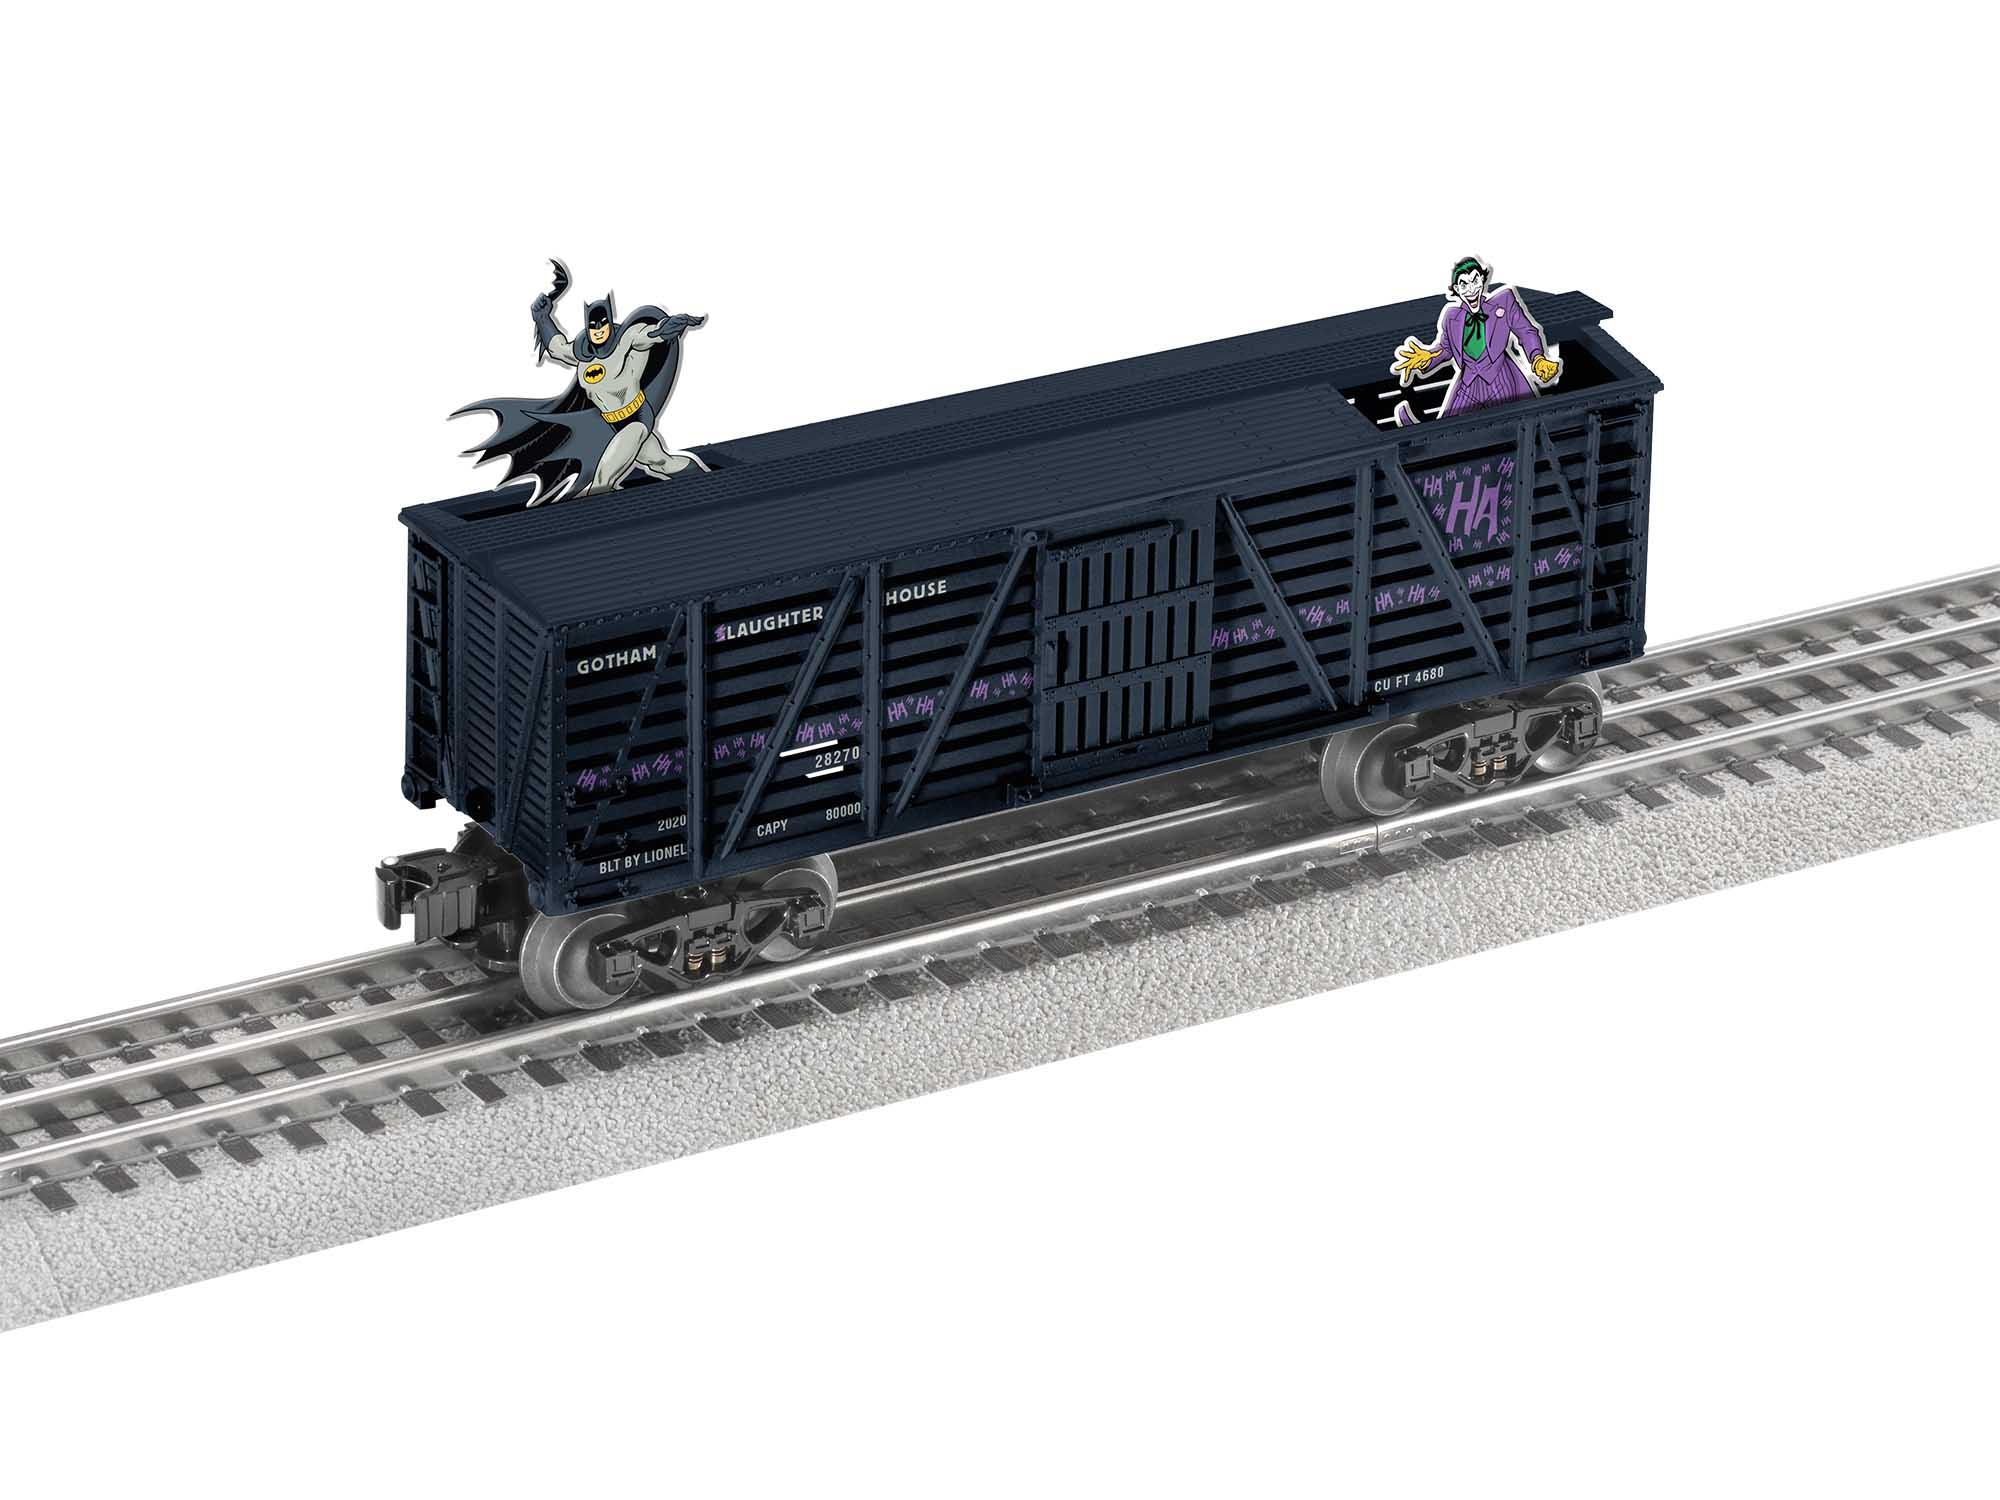 Lionel 2028270 O27 Box Batman vs. The Joker